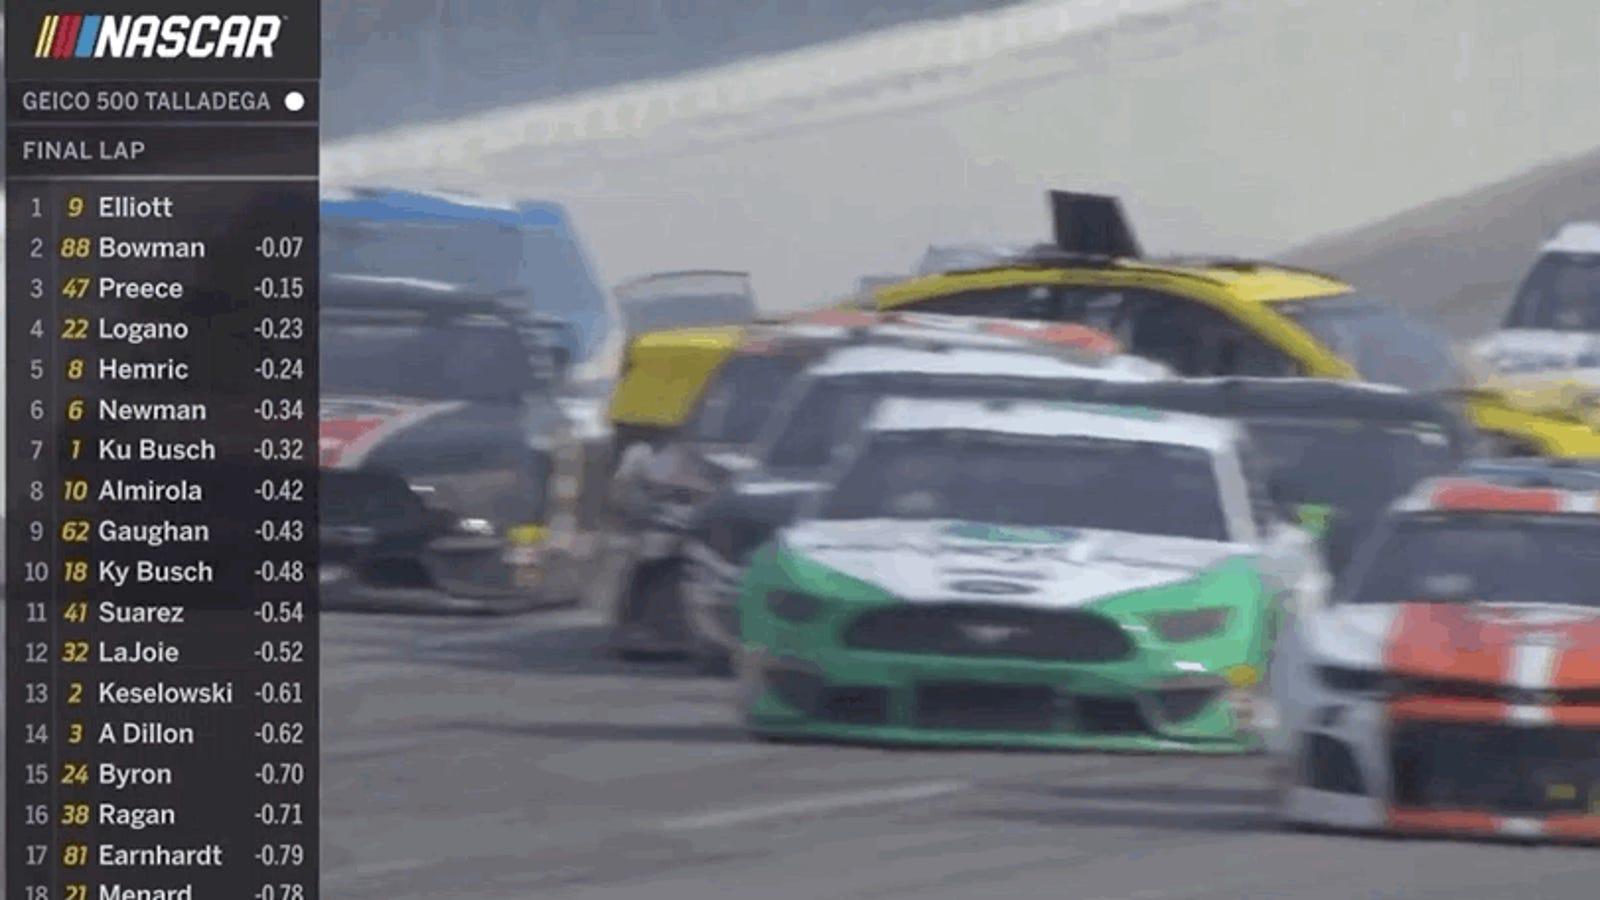 The Race-Ending NASCAR Caution at Talladega Wasn't for the Massive Last-Lap Wreck, It Was for Debris - Jalopnik